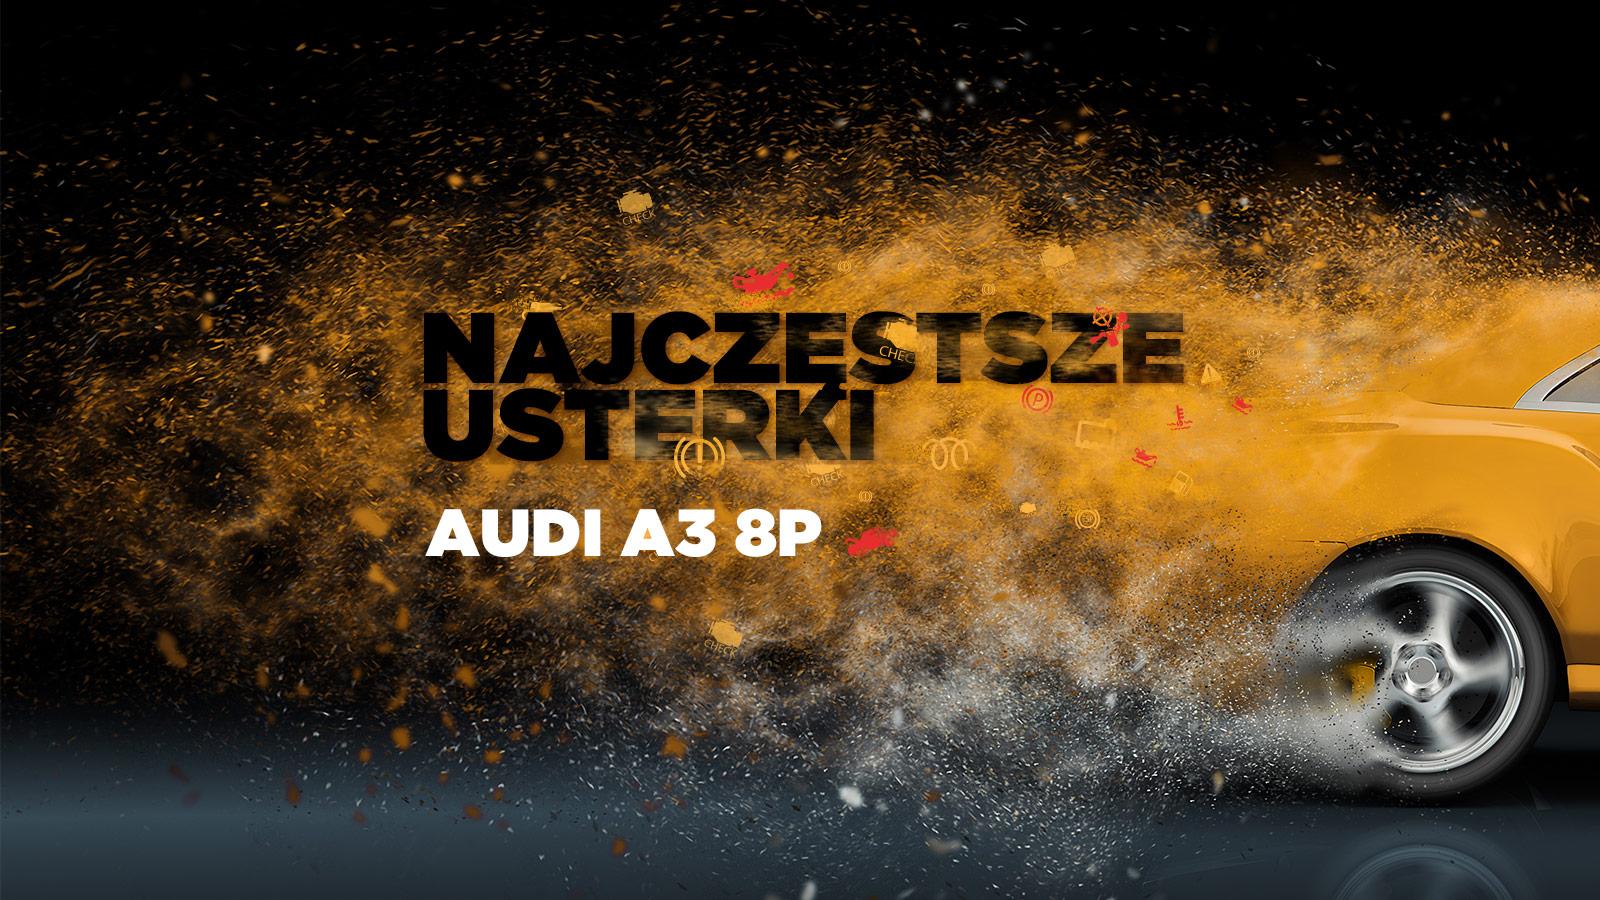 Najczęstsze usterki Audi A3 8P